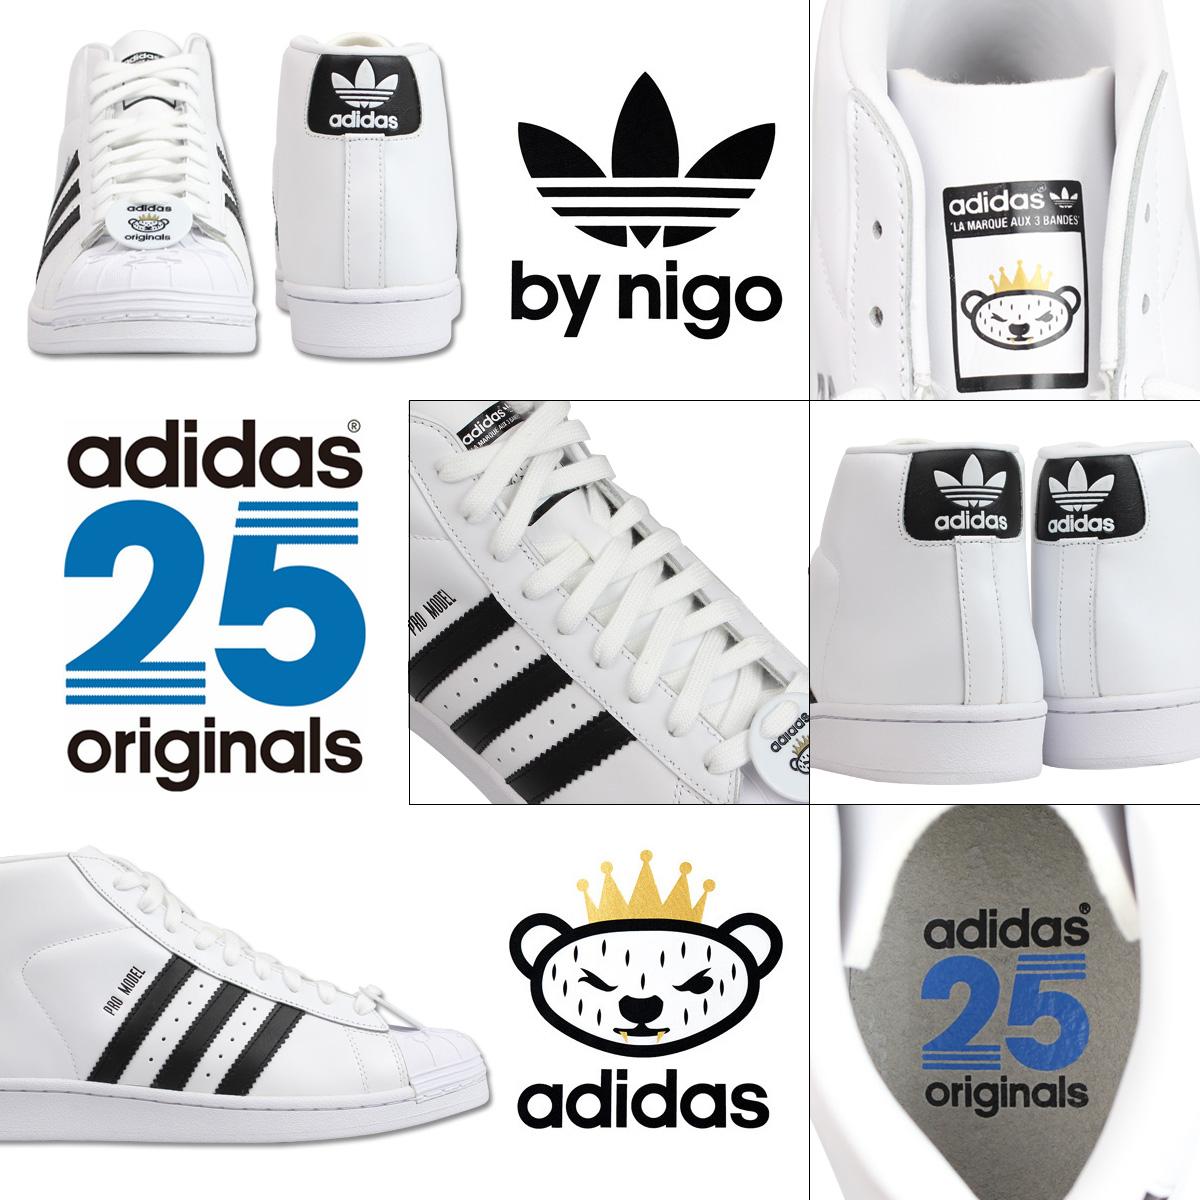 marketing of adidas